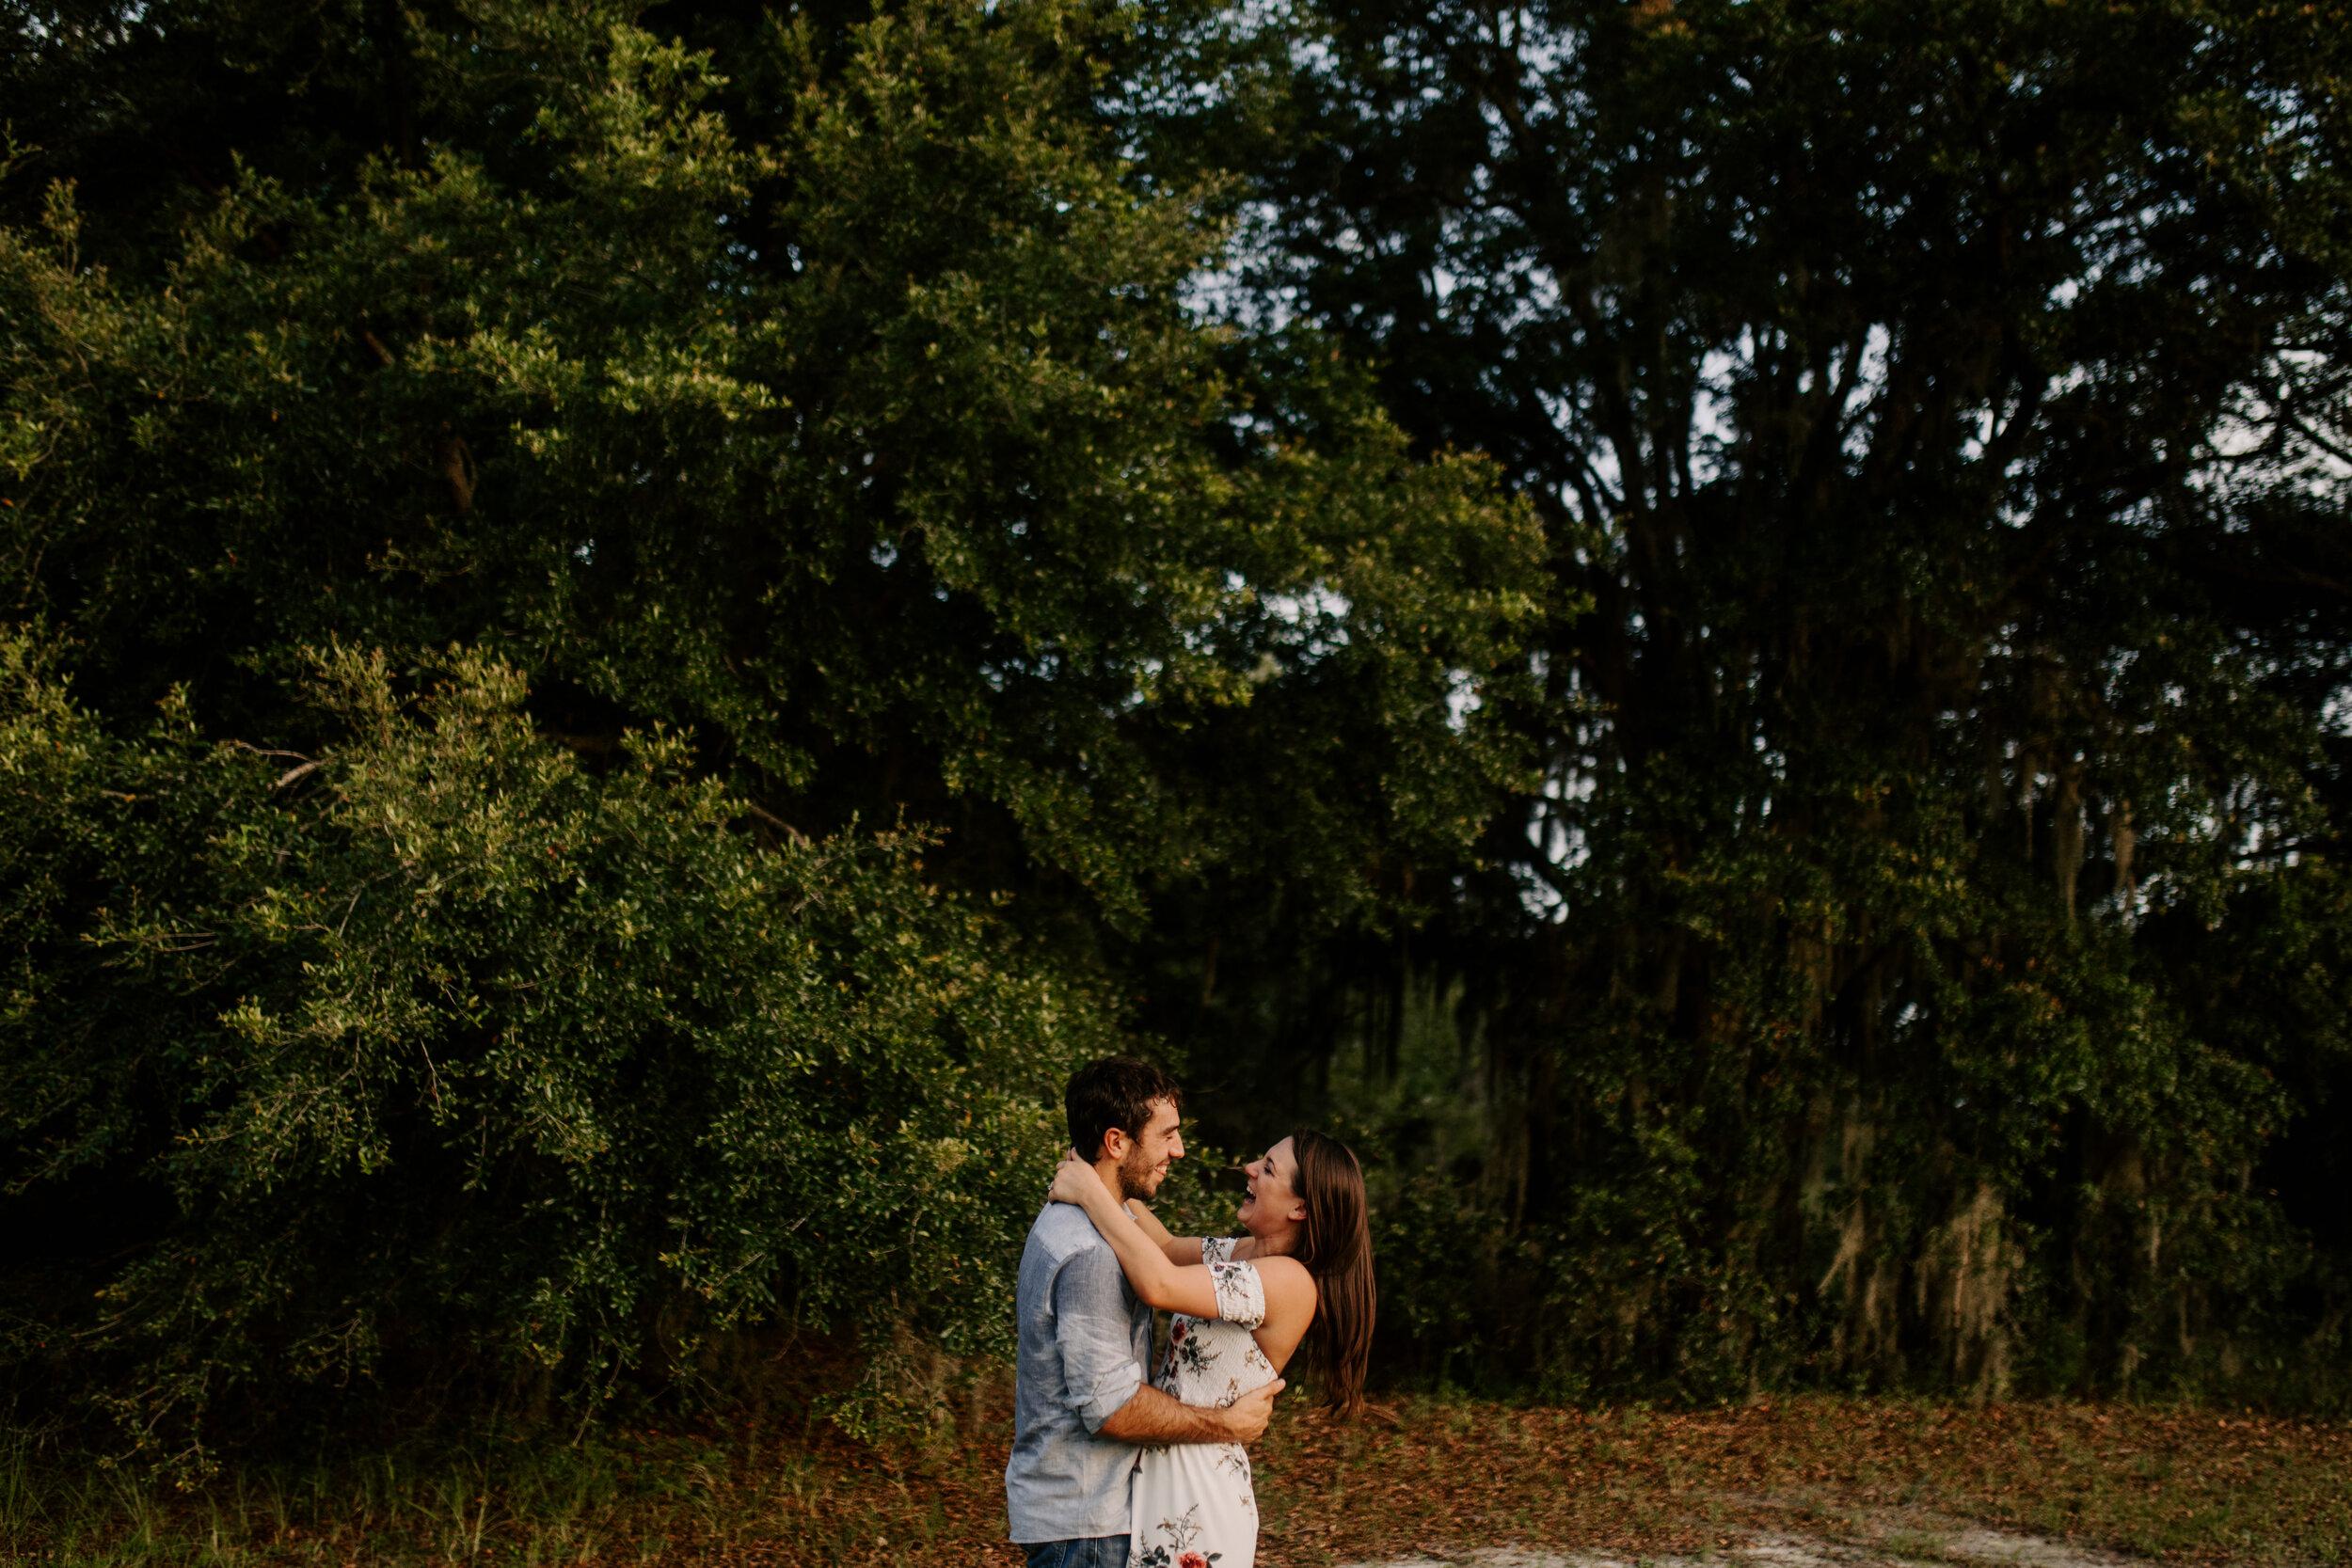 Jenna_+_Ryan_-_Native_Expressions_-_Florida_Engagement-292.jpg